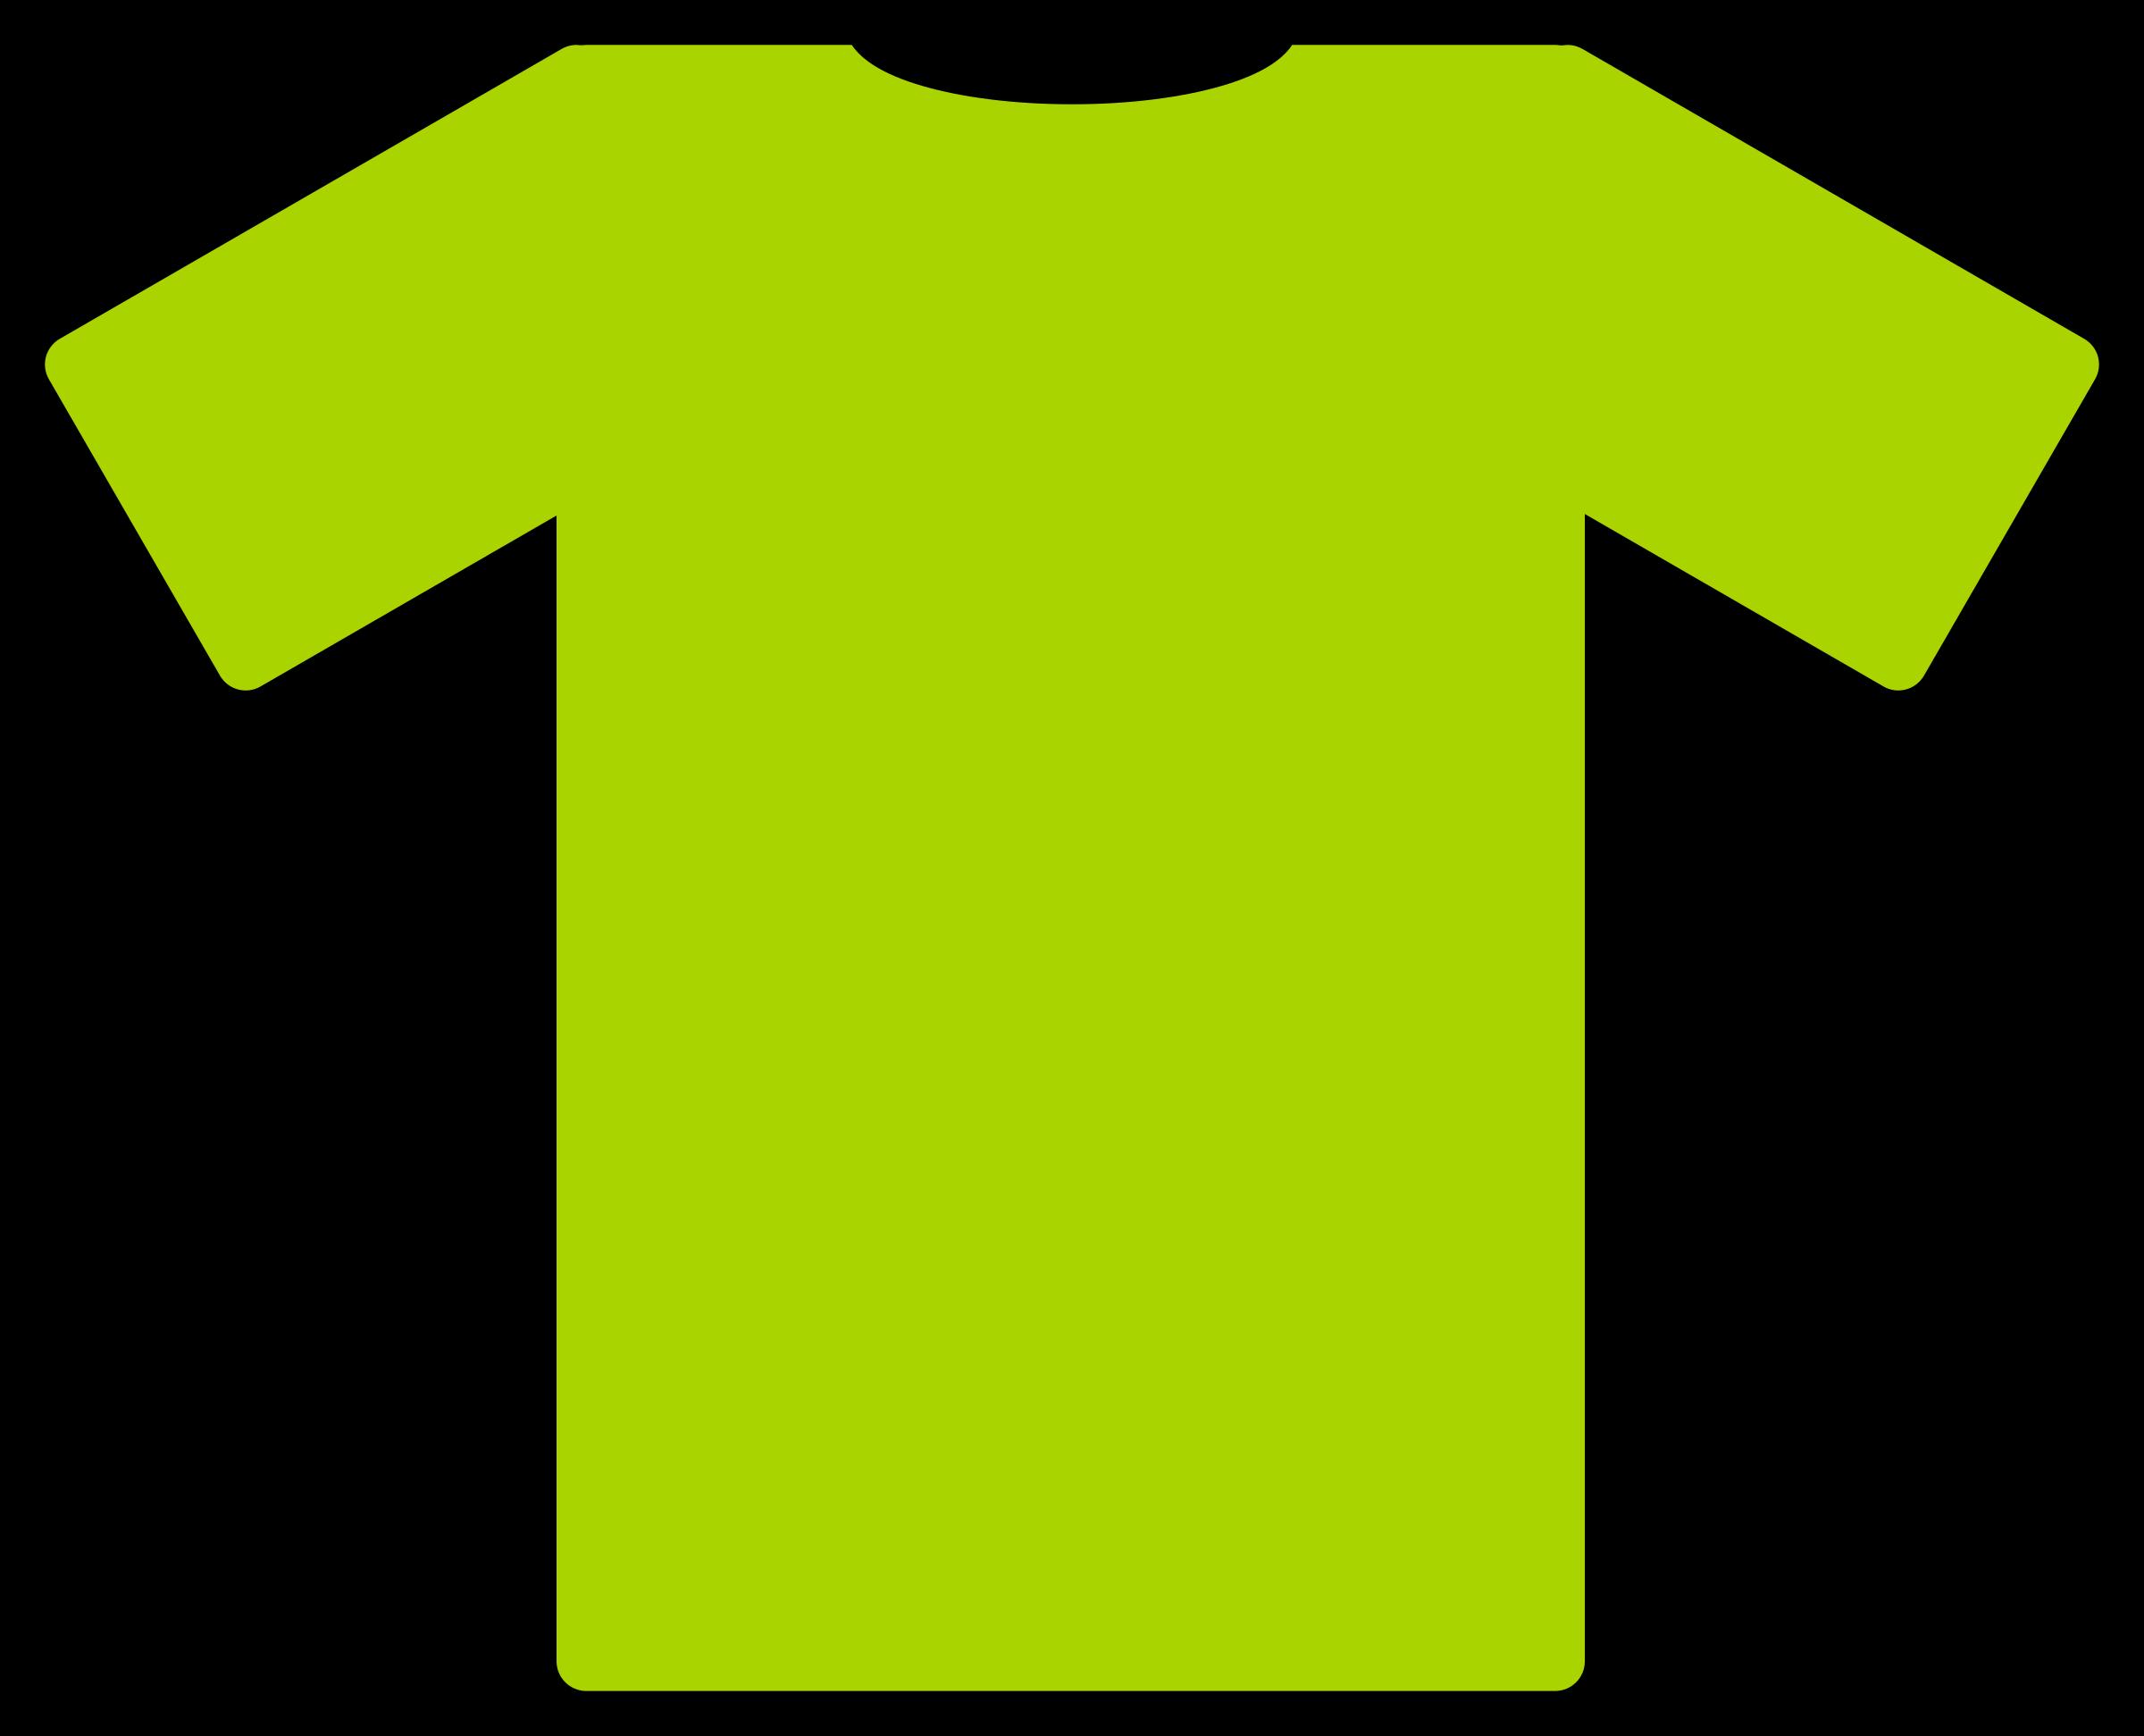 Green t big image. Clipart shirt clothing